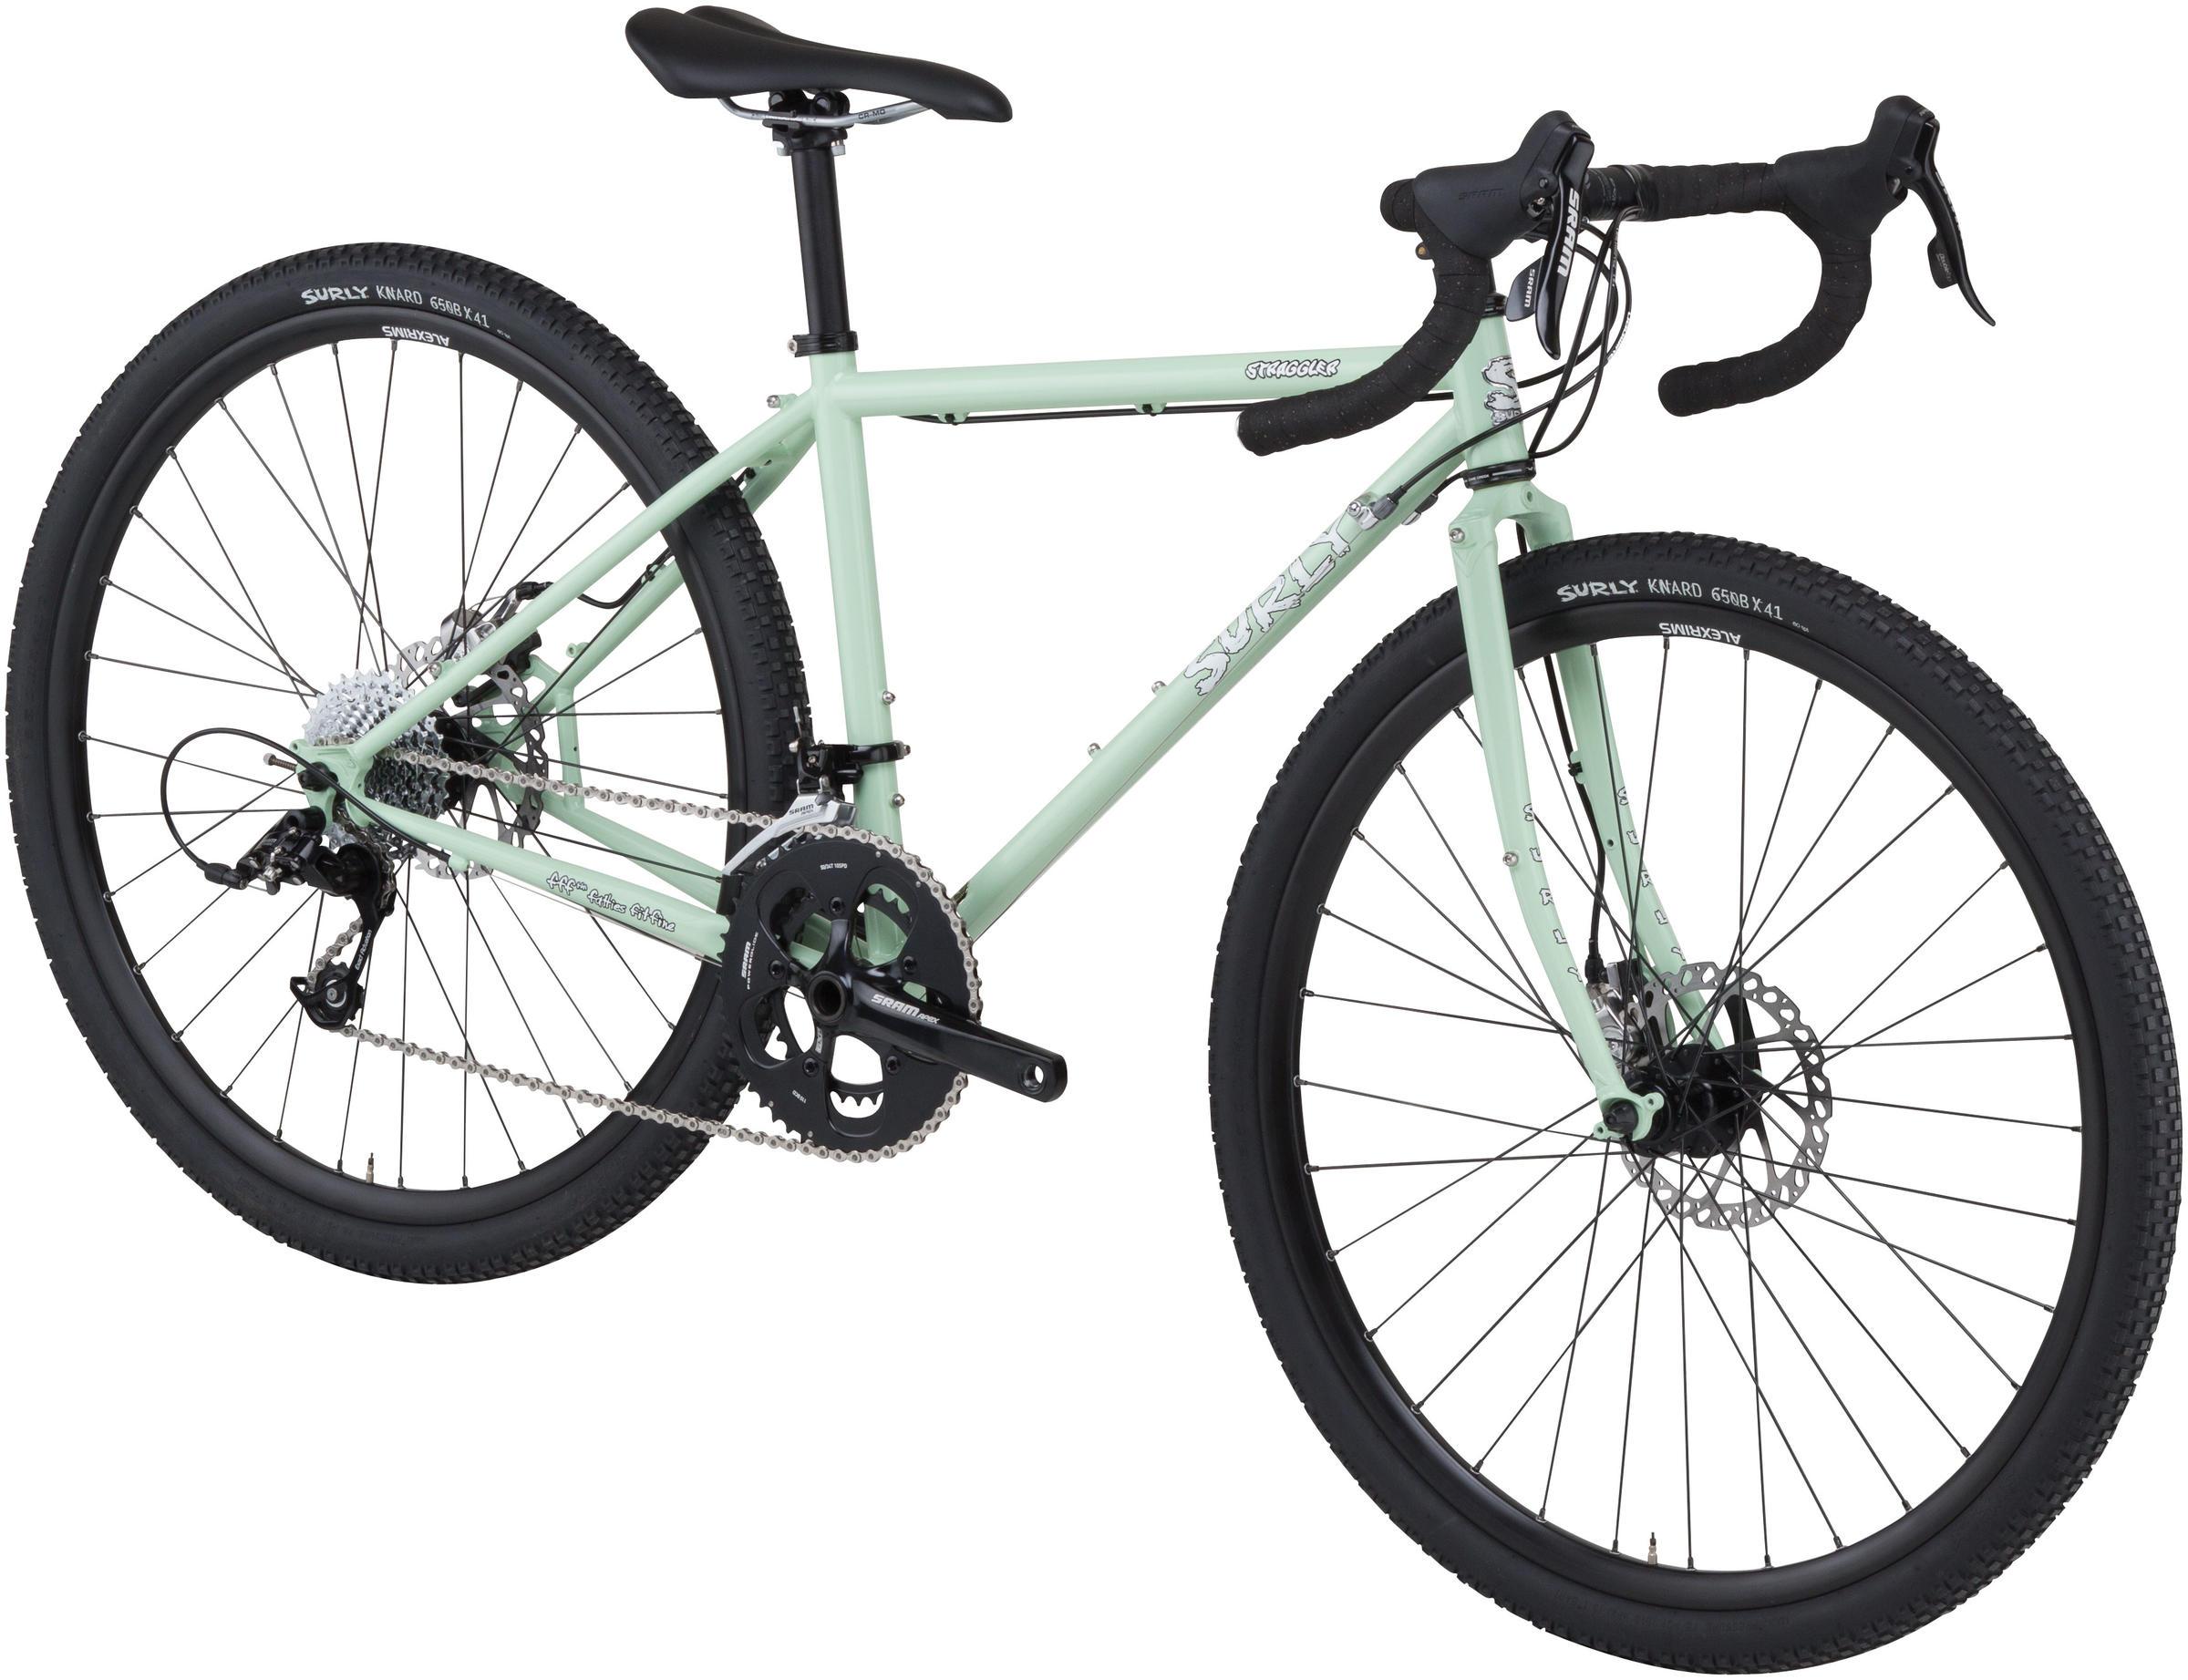 c4302cfdb18 Surly Straggler 650b - Wheel & Sprocket | One of America's Best Bike Shops